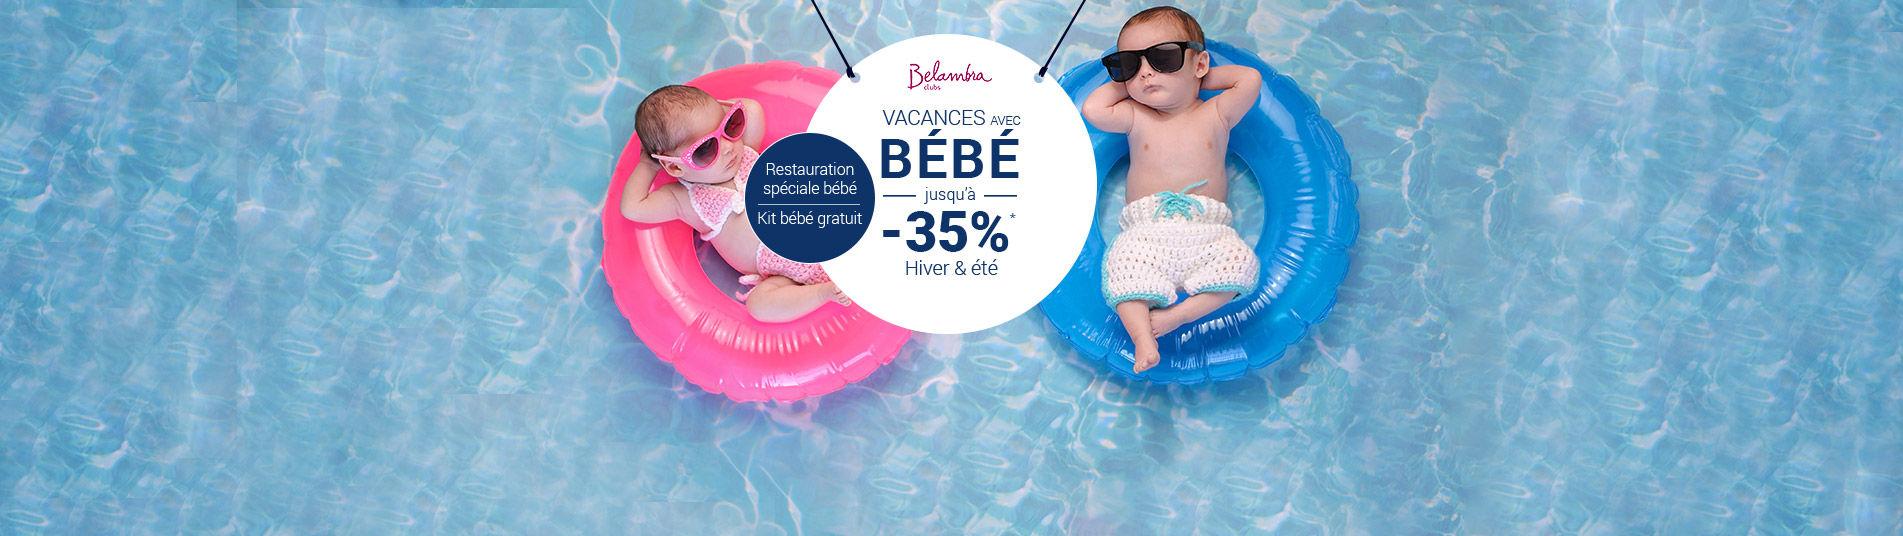 Vacances en Club avec Belambra avec bébé